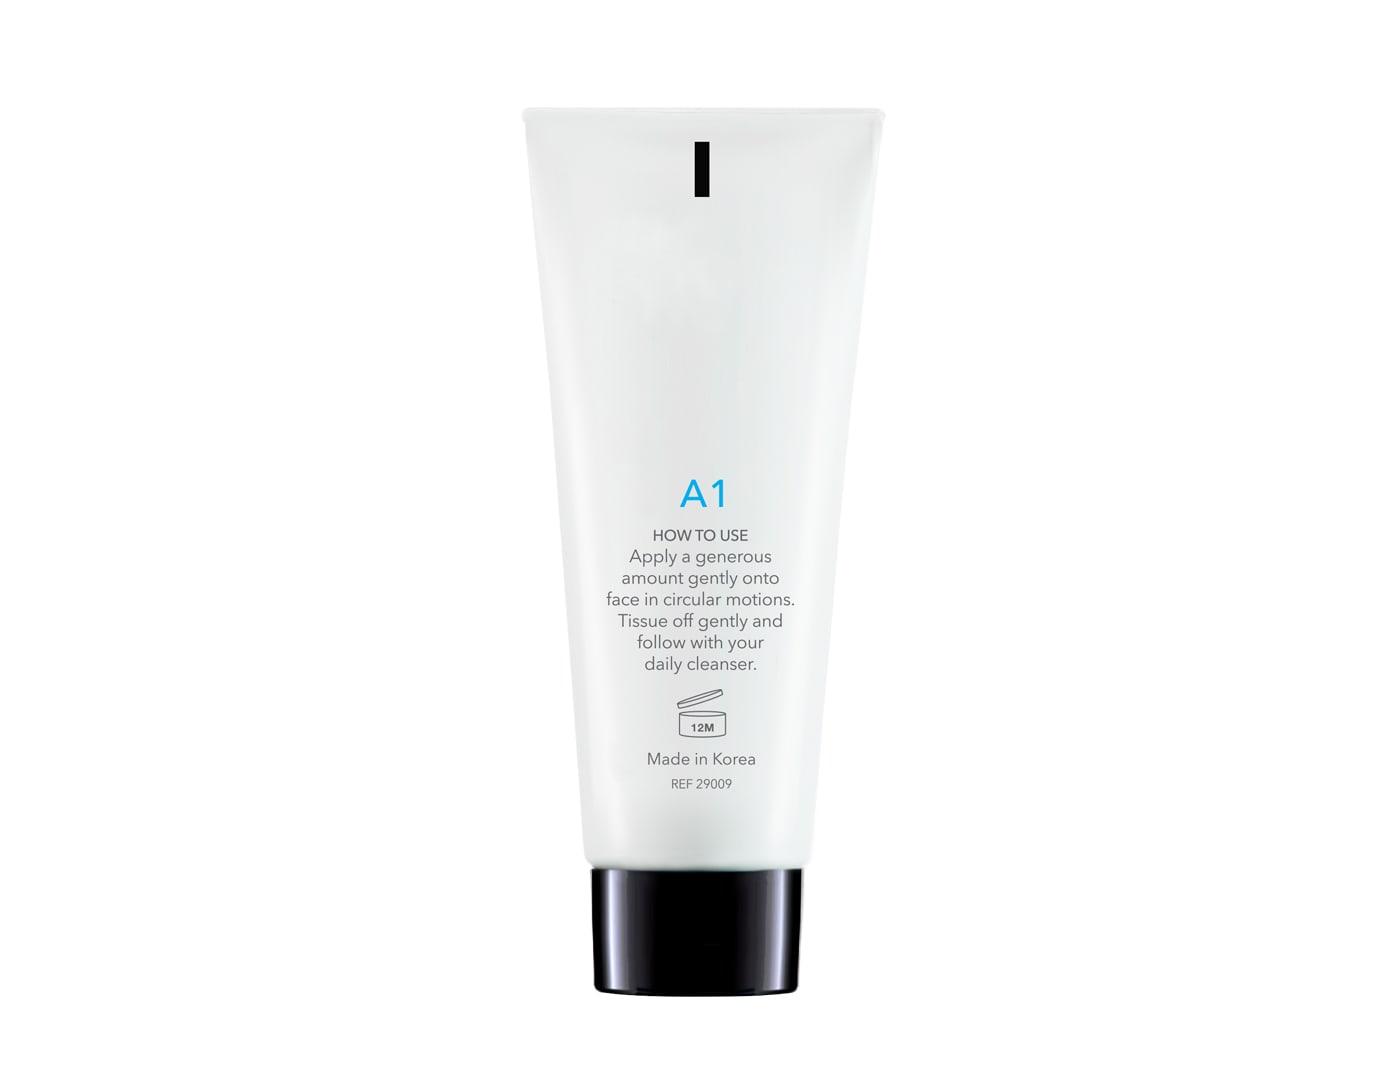 DR's Secret Aestier Cleansing Cream A1 back